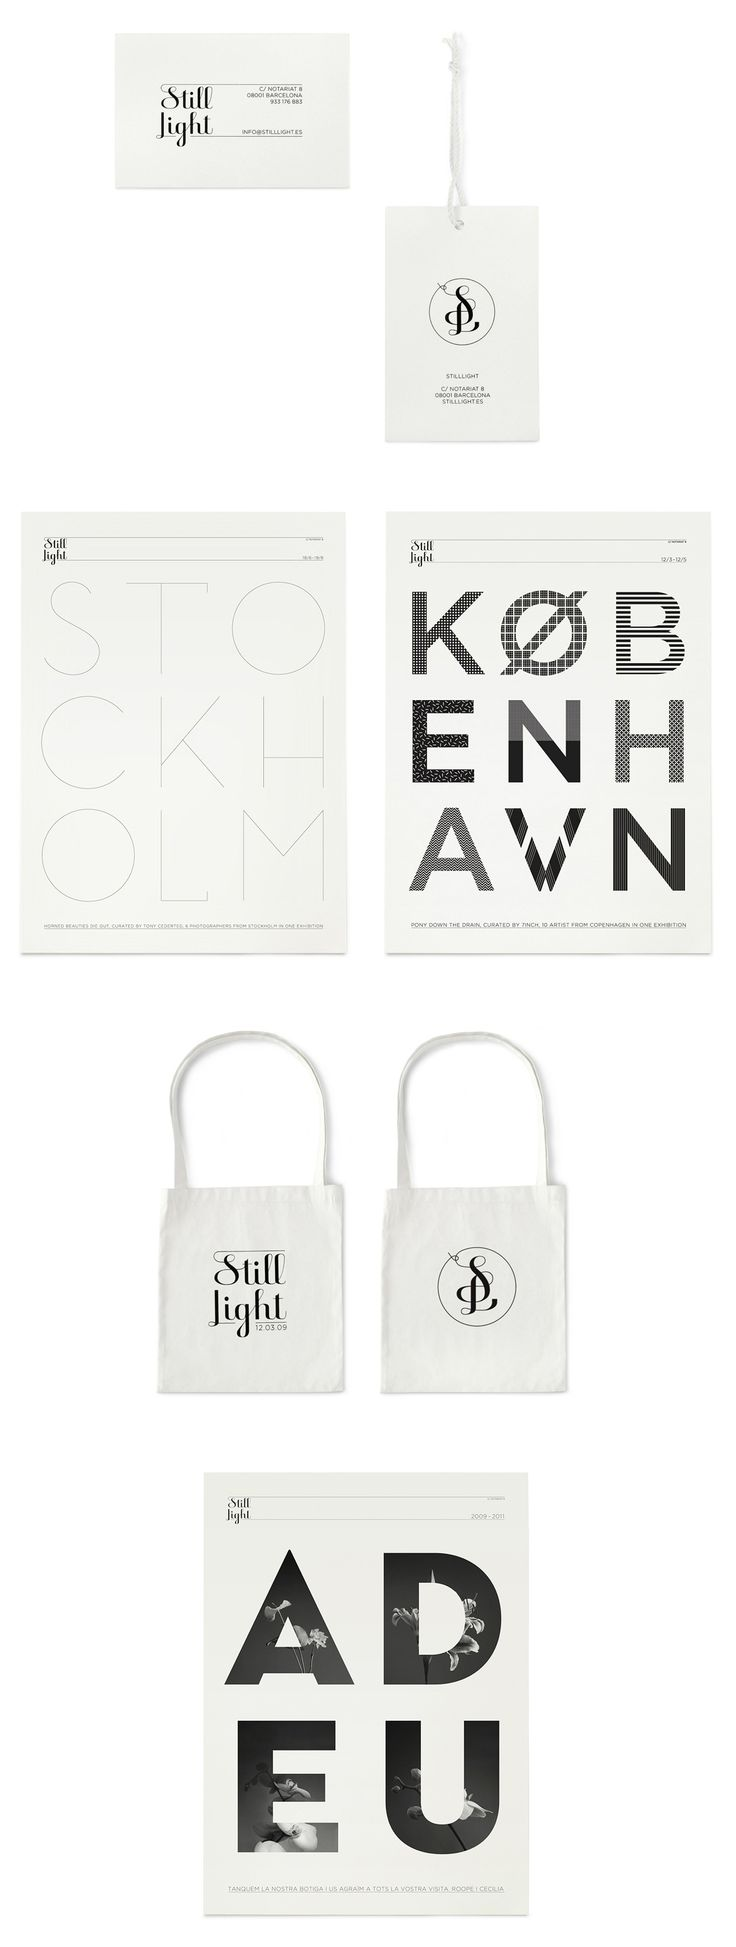 Identity program with logotype/monogram and posters for Still Light Shop, Barcelona 2009 - 2011. Design by Klas Ernflo.